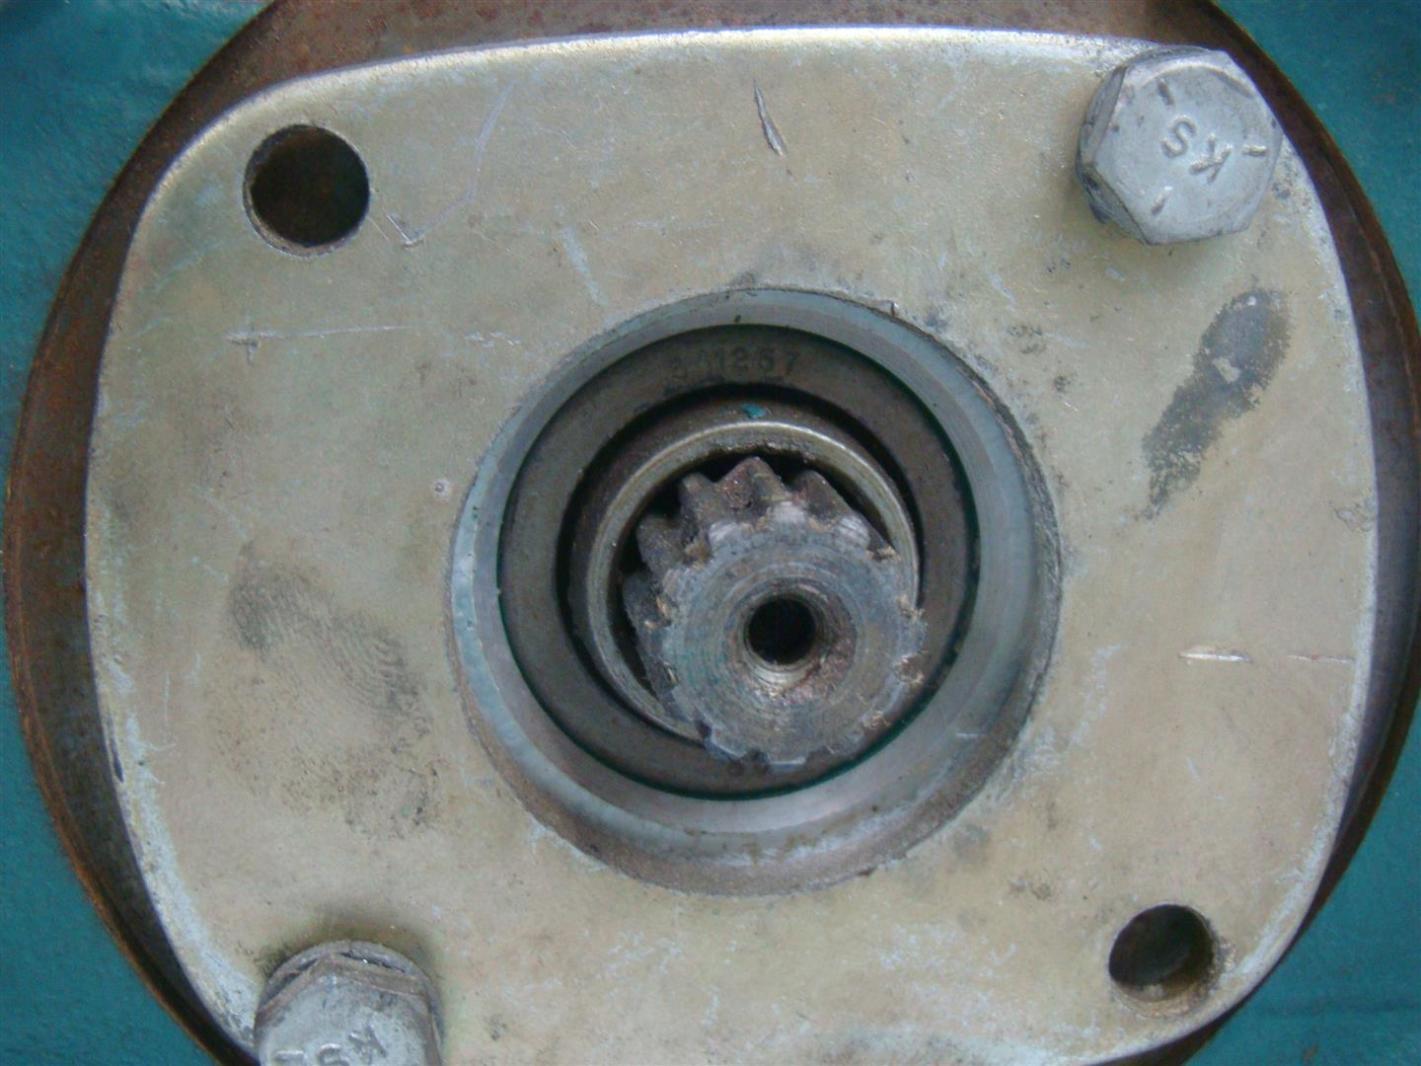 Reliance Electric Master Gearmotor Gearbox Ratio 50 1 1